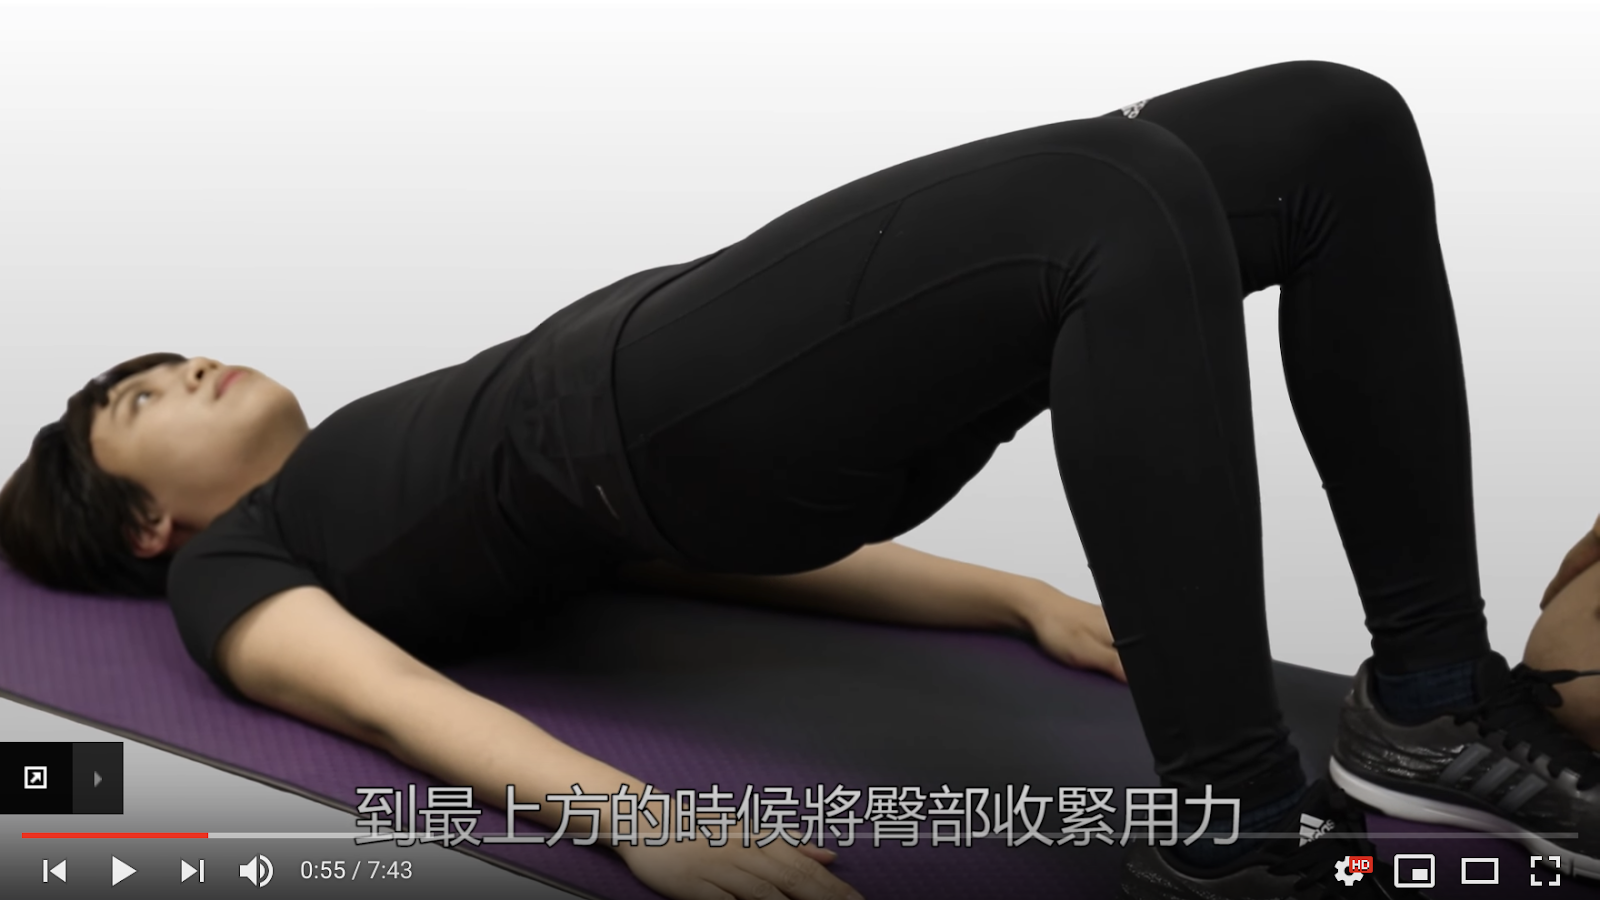 <SuperFIT居家健身菜單>8分鐘翹臀養成運動計畫-橋式